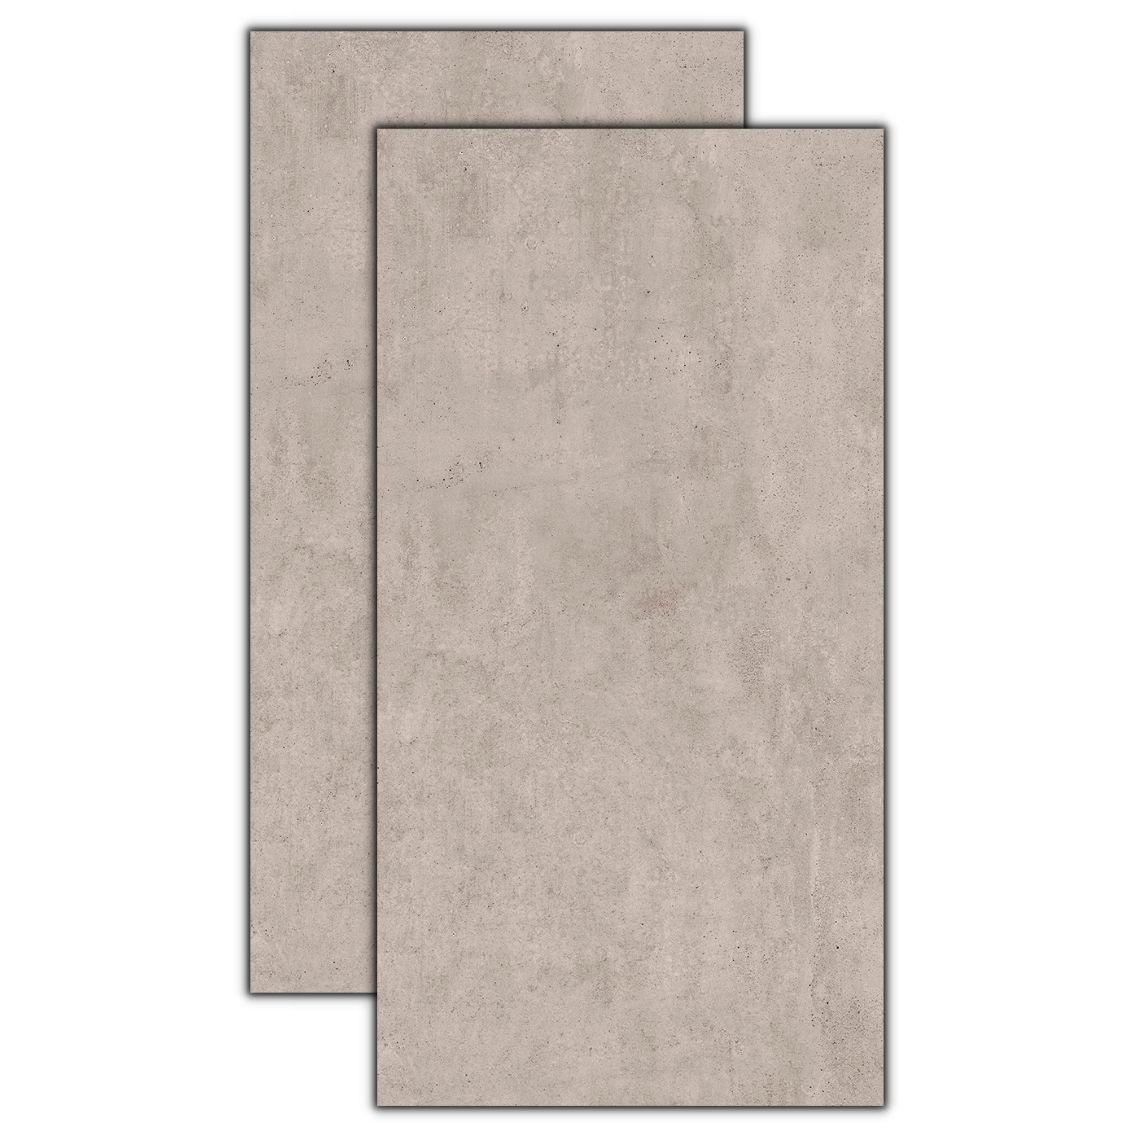 Toronto Cement Out 63x120 cm <br /><b>R$ 81,90 M² </b><br />Cx 2,27 M² <b> R$ 185,91</b>